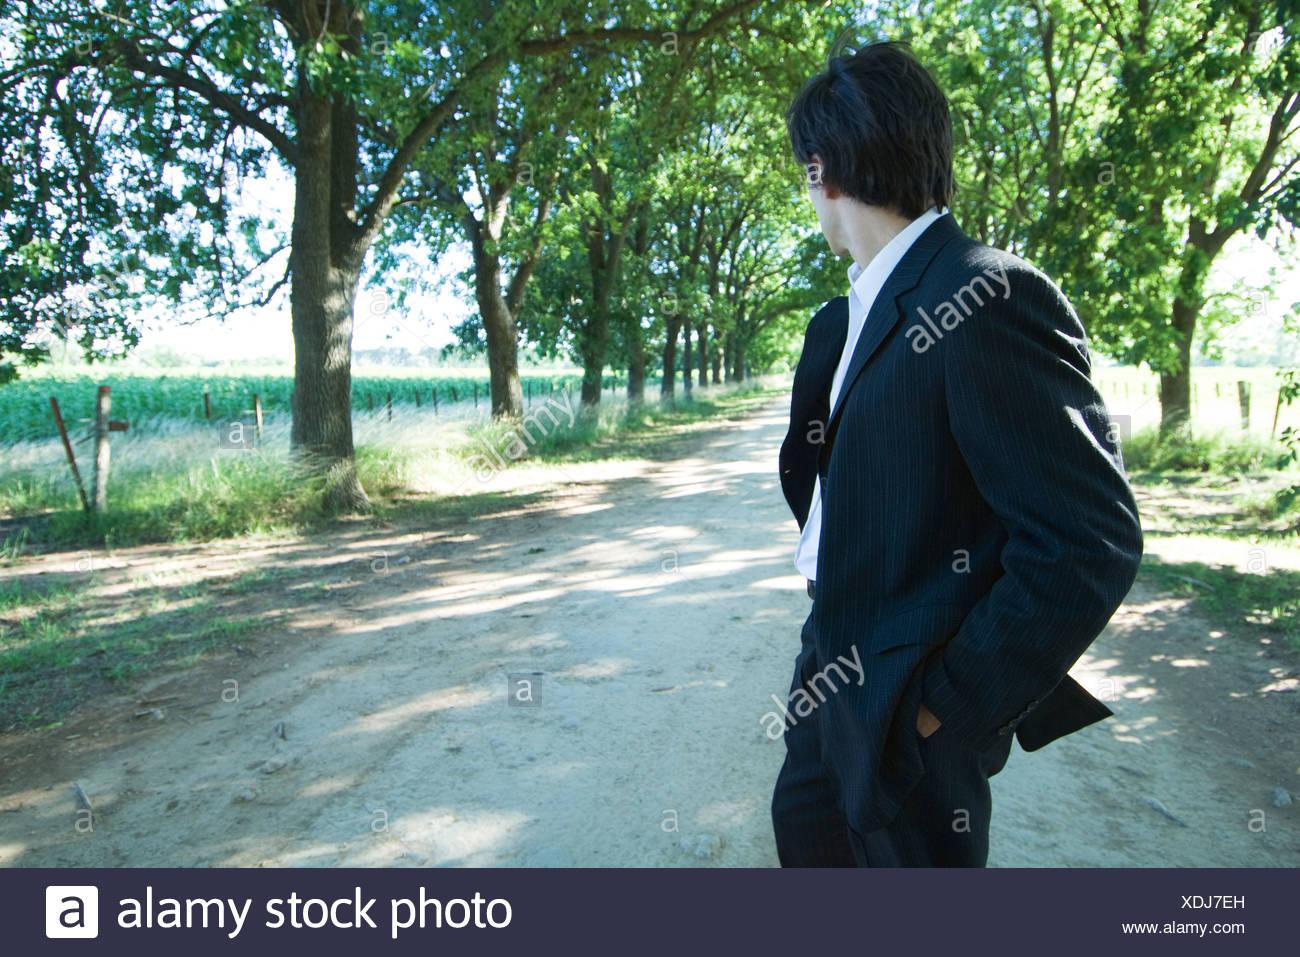 Businessman walking on rural road, looking over shoulder - Stock Image